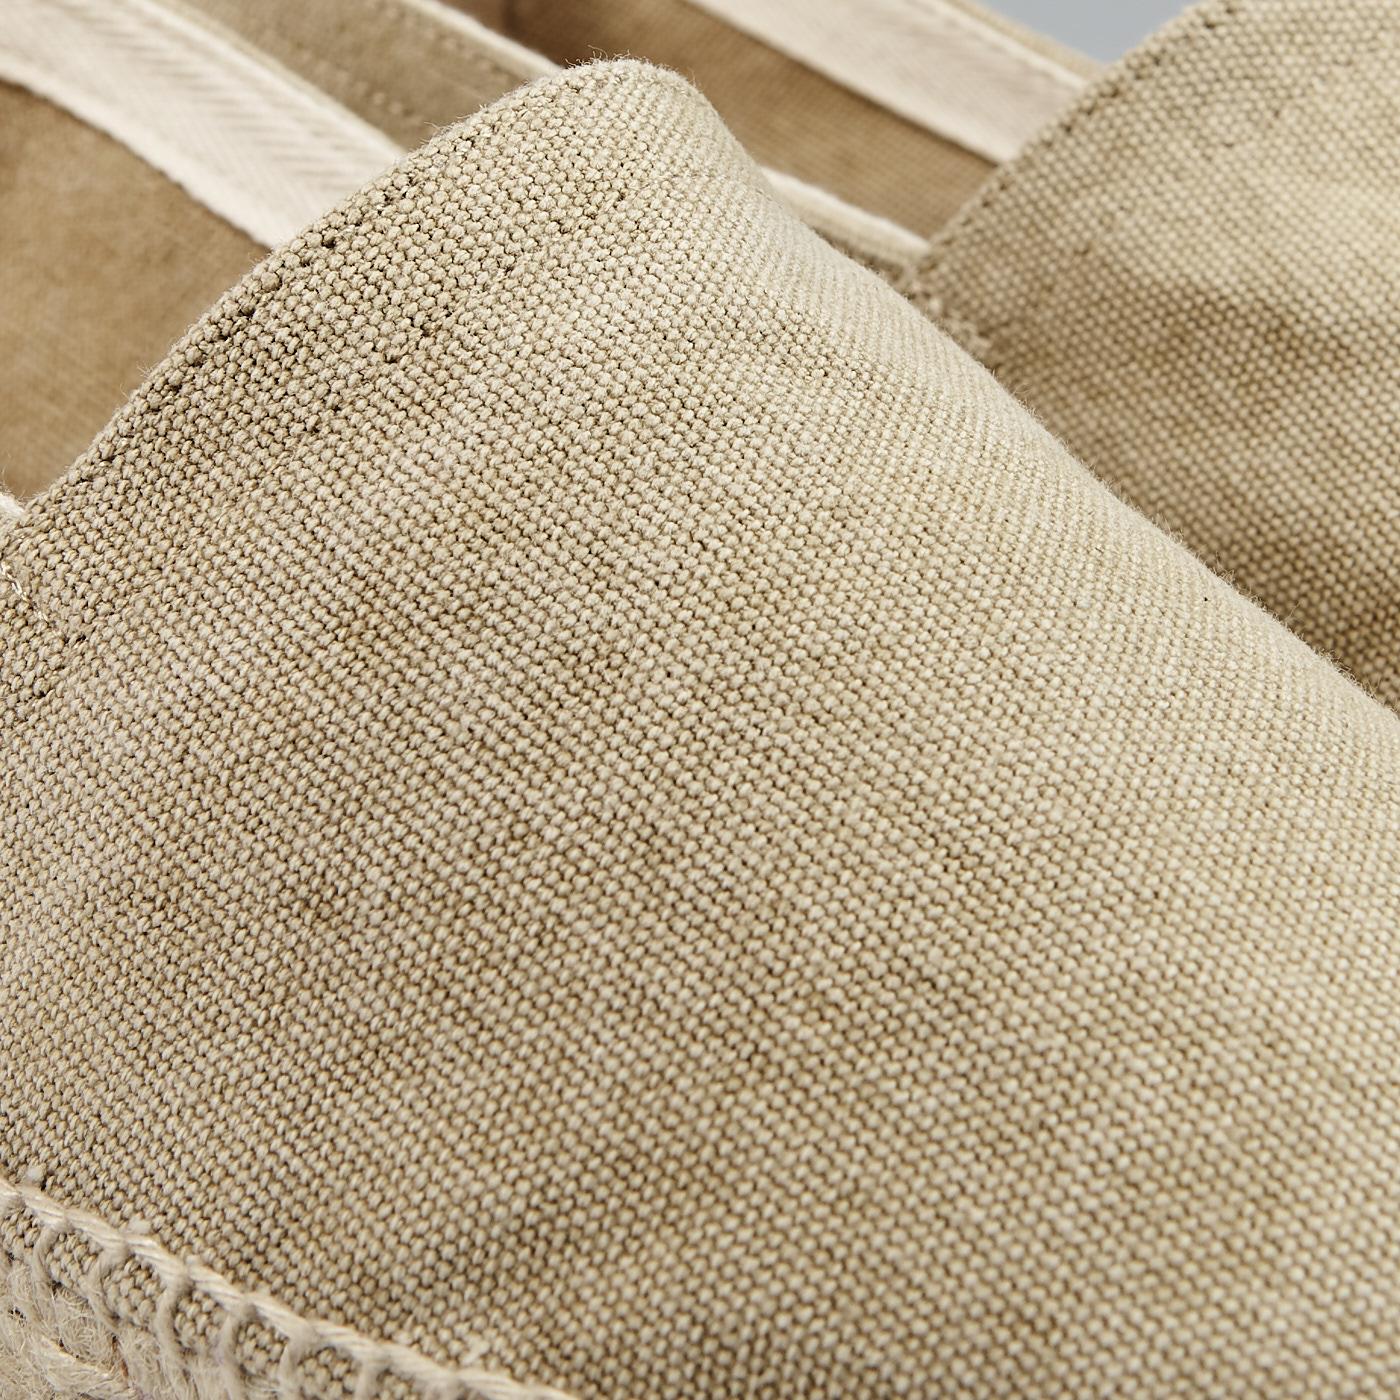 Castañer Sand Beige Cotton Pablo Espadrilles Fabric